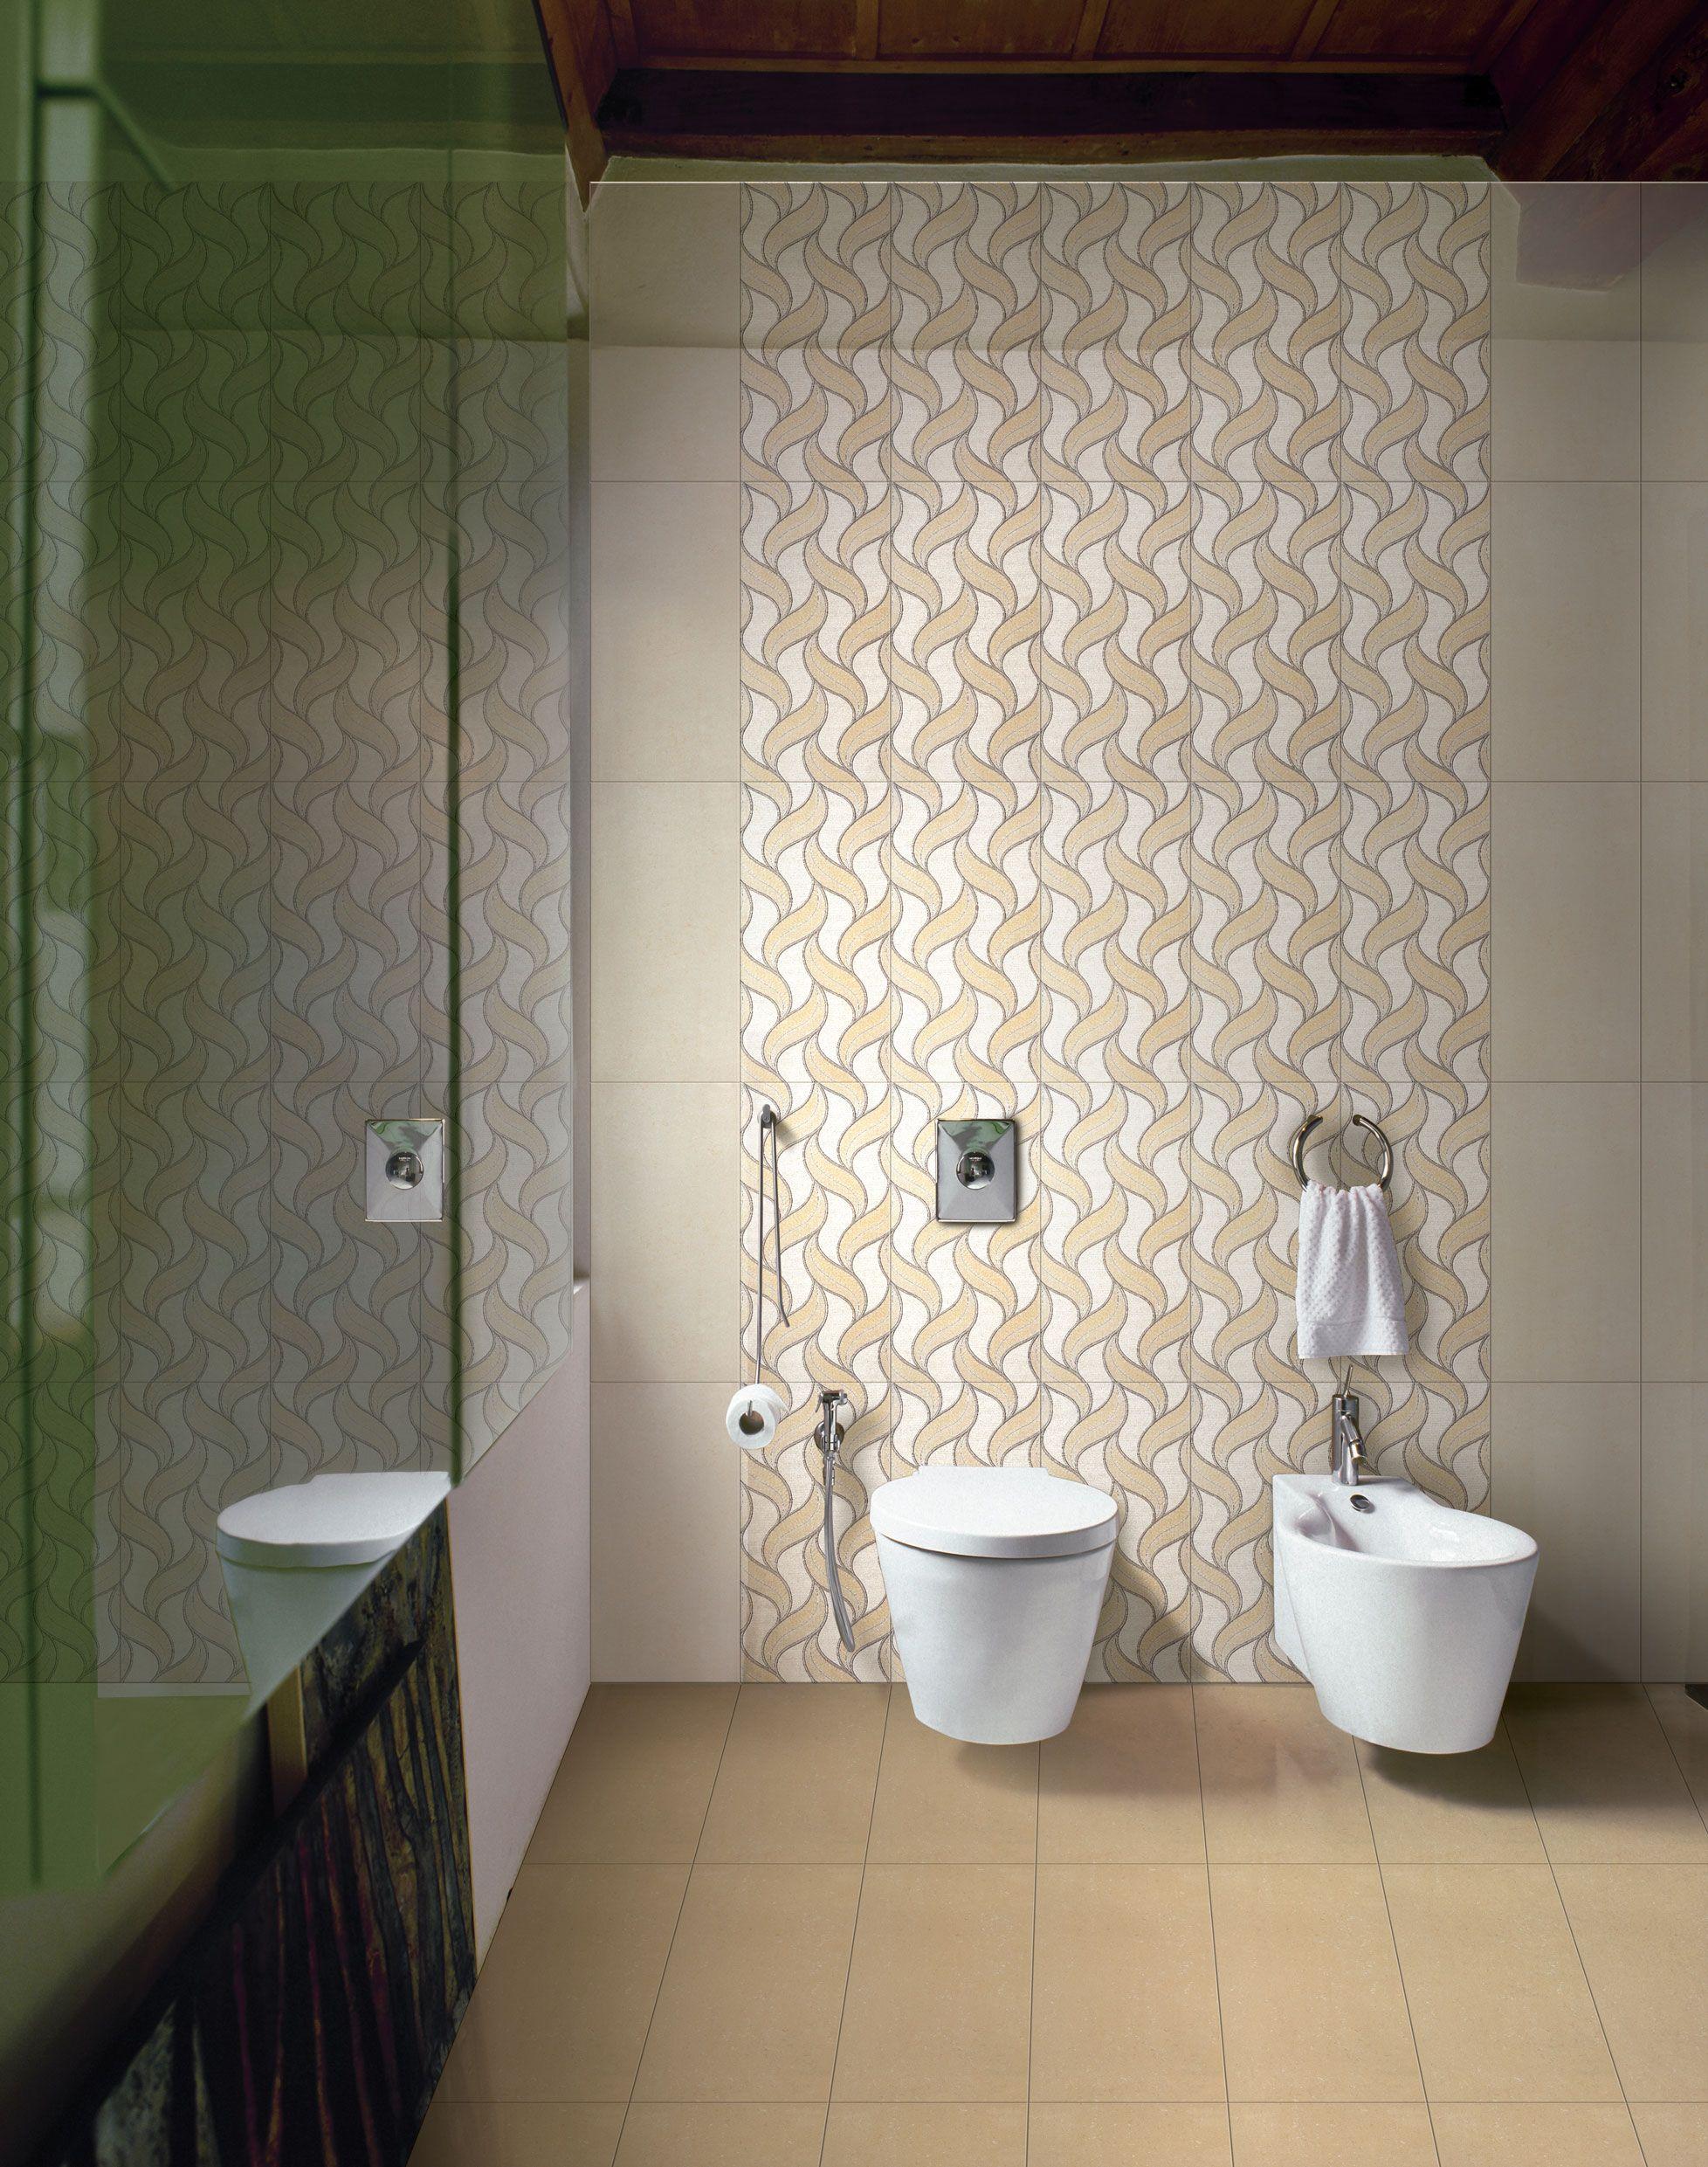 Ceramic Tile Designs For Bathroom Walls Best Kitchen Gallery ...